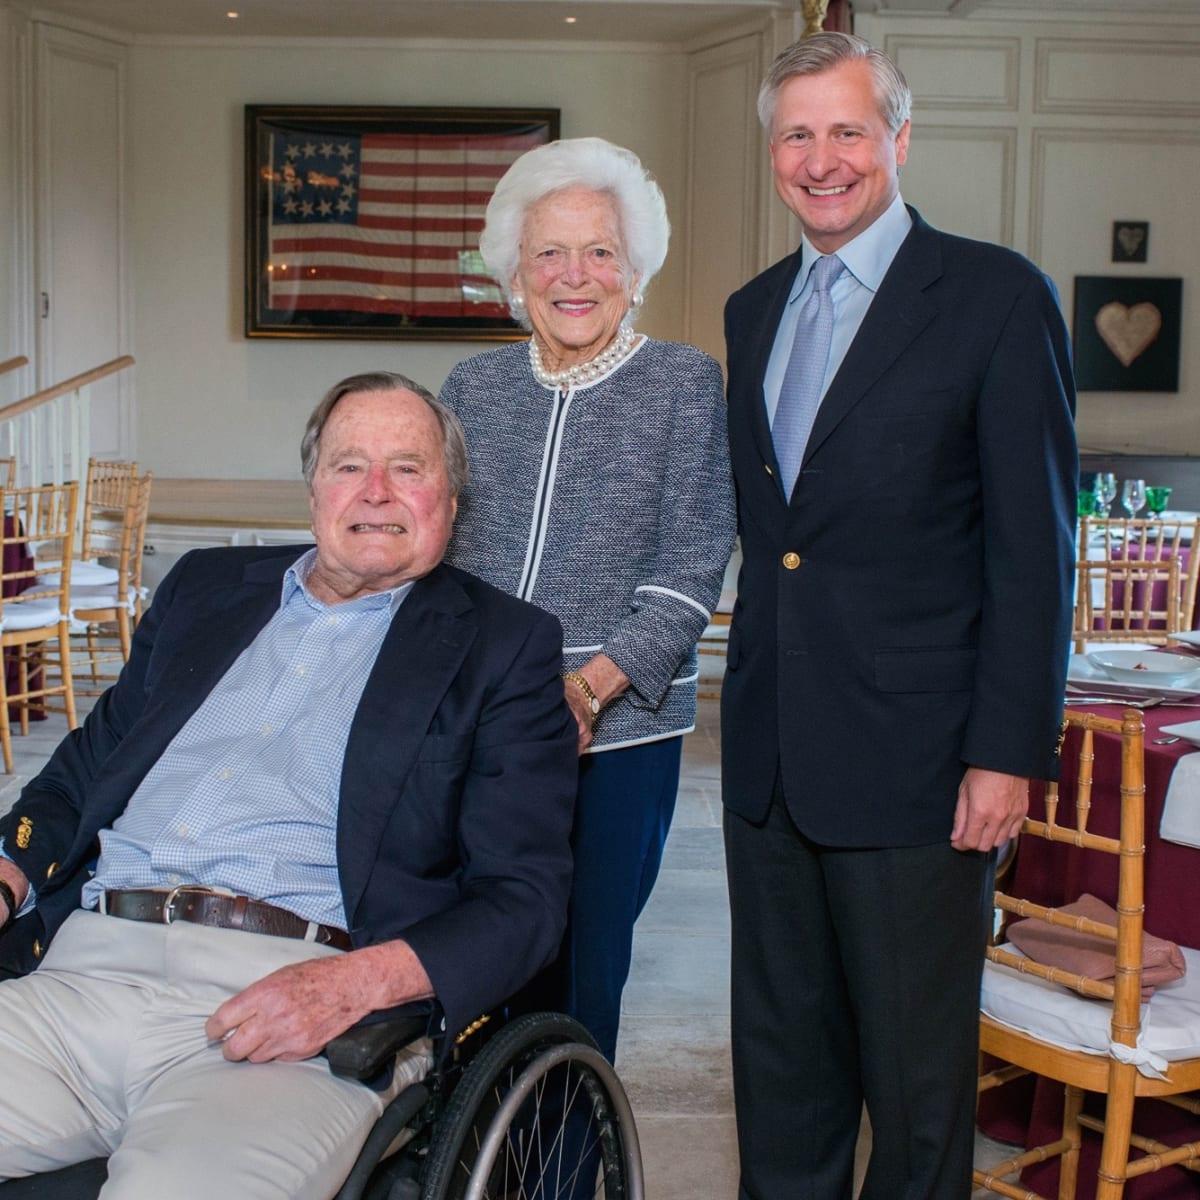 Barbara Bush Literacy Luncheon, 4/16, President George H.W. Bush, Barbara Bush, Jon Meachem